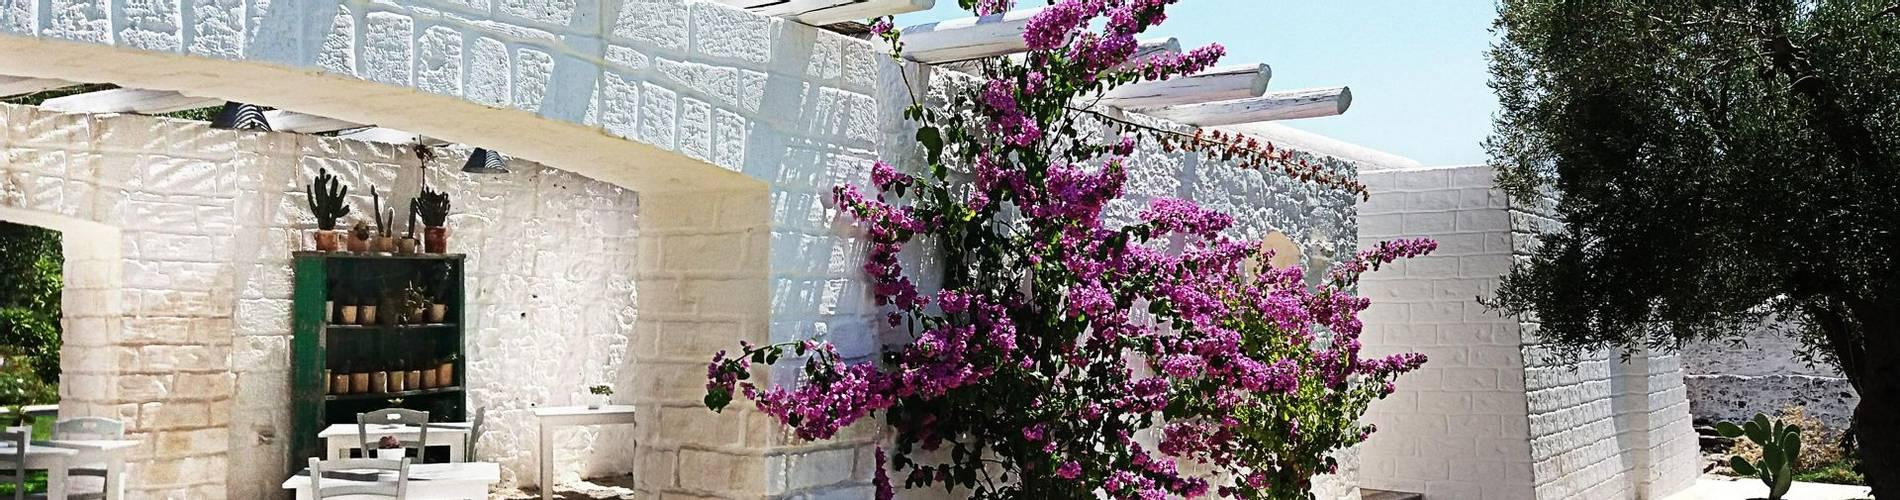 Masseria Cervarolo, Puglia, Italy (58).jpg